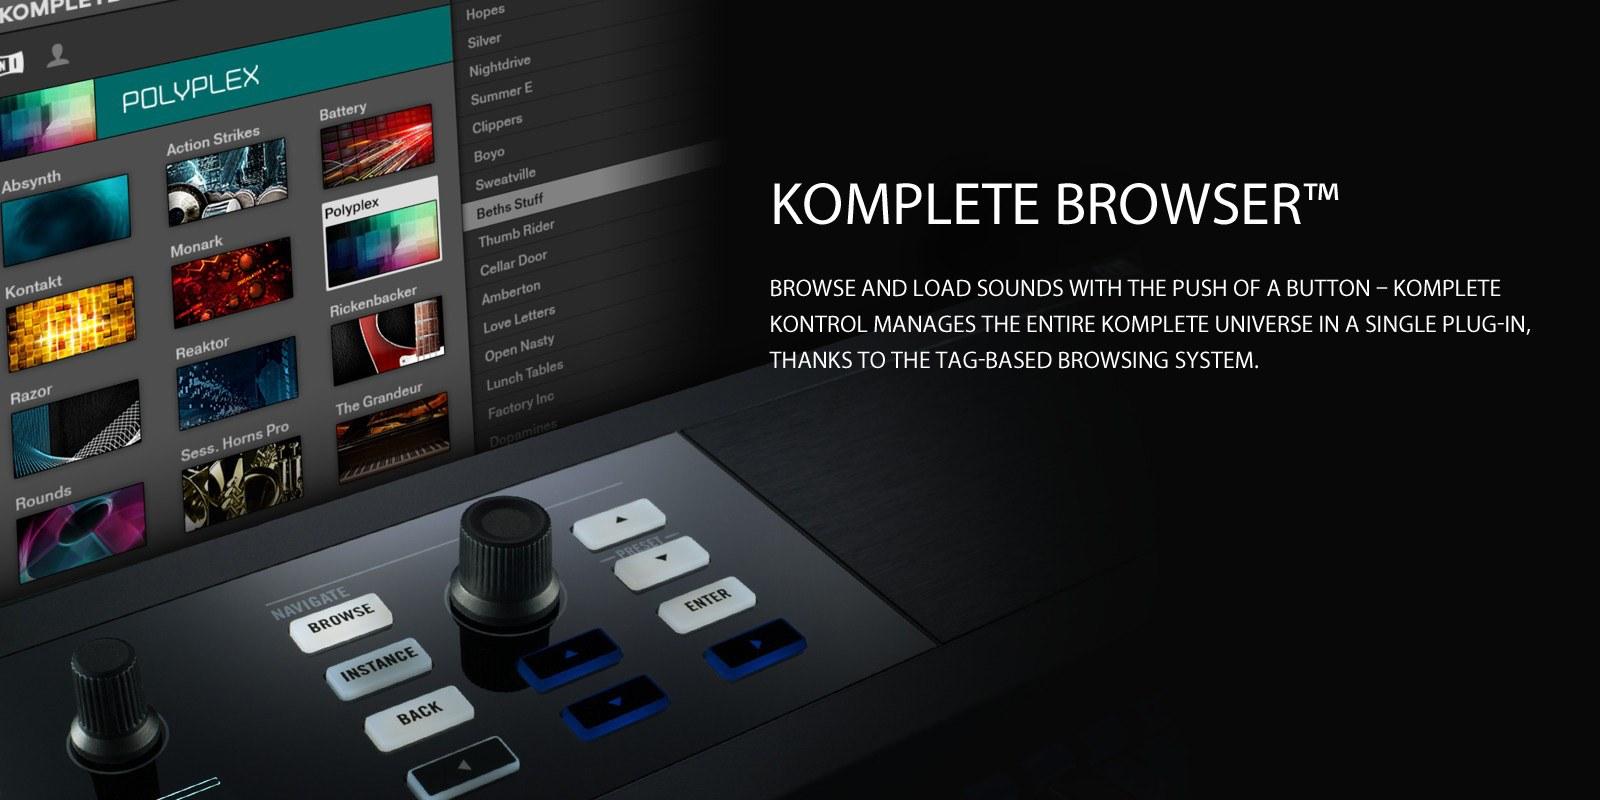 komplete kontrol - browser